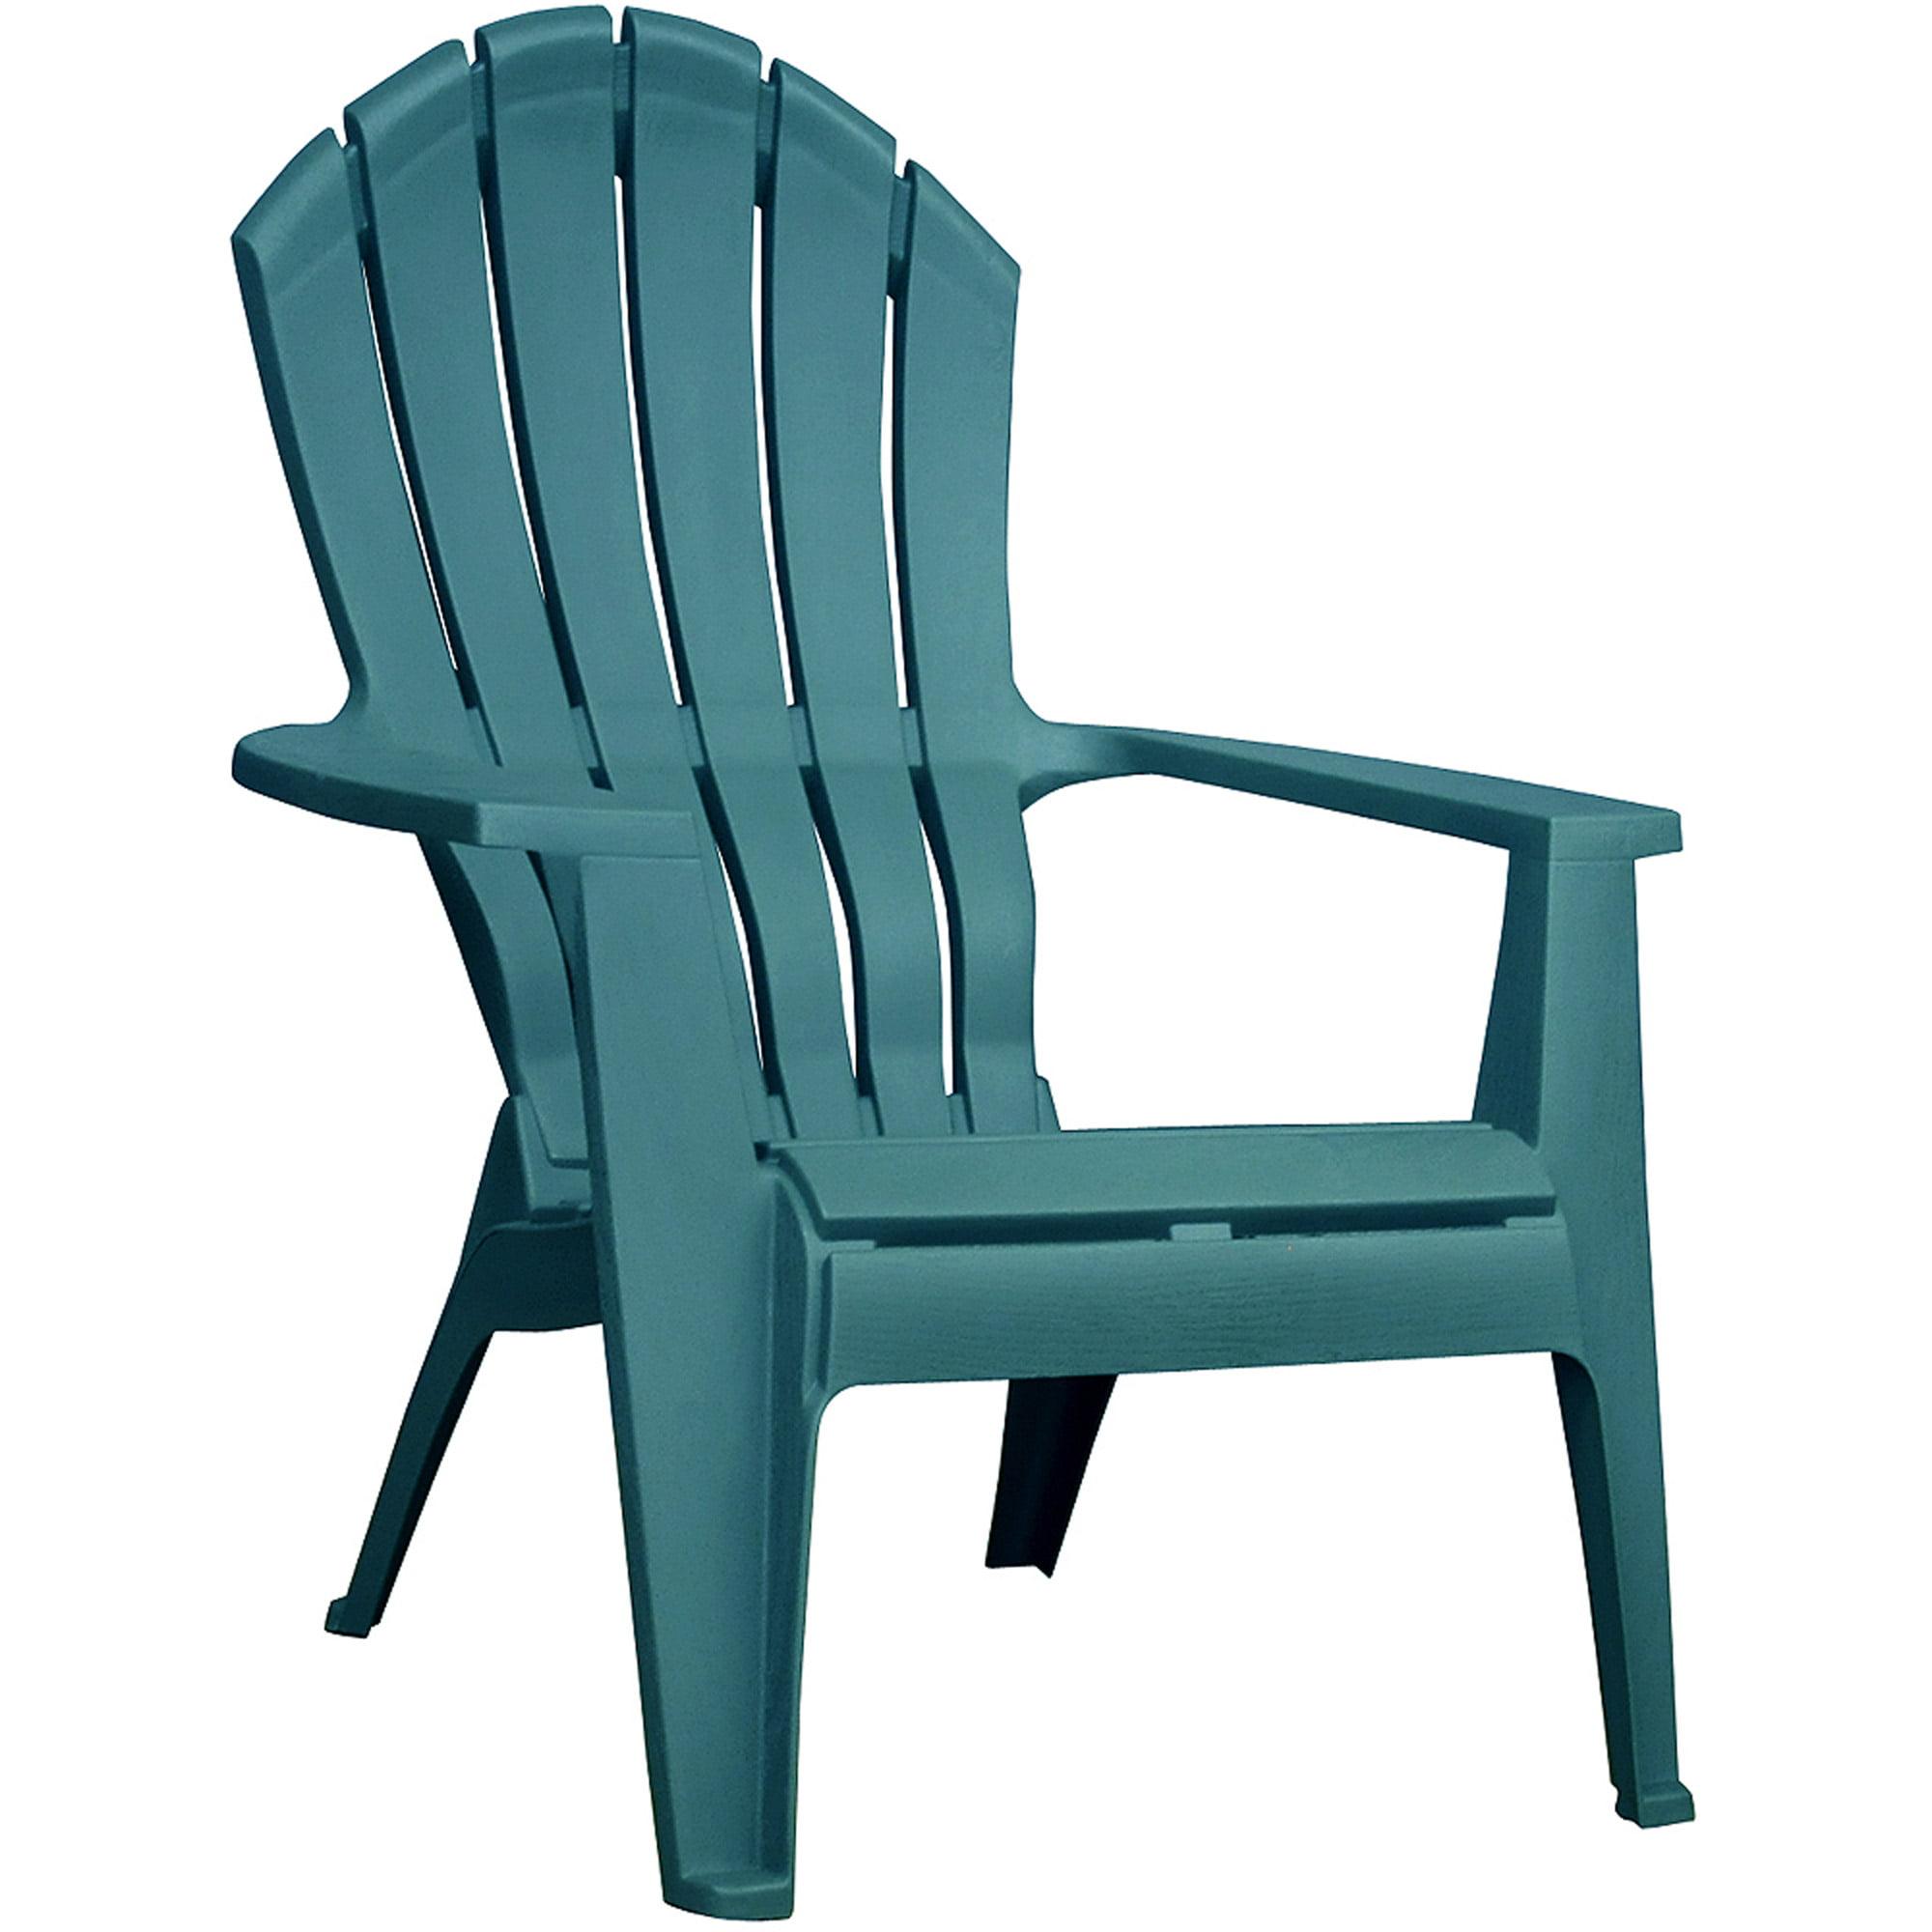 Colorful adirondack chairs - Colorful Adirondack Chairs 32